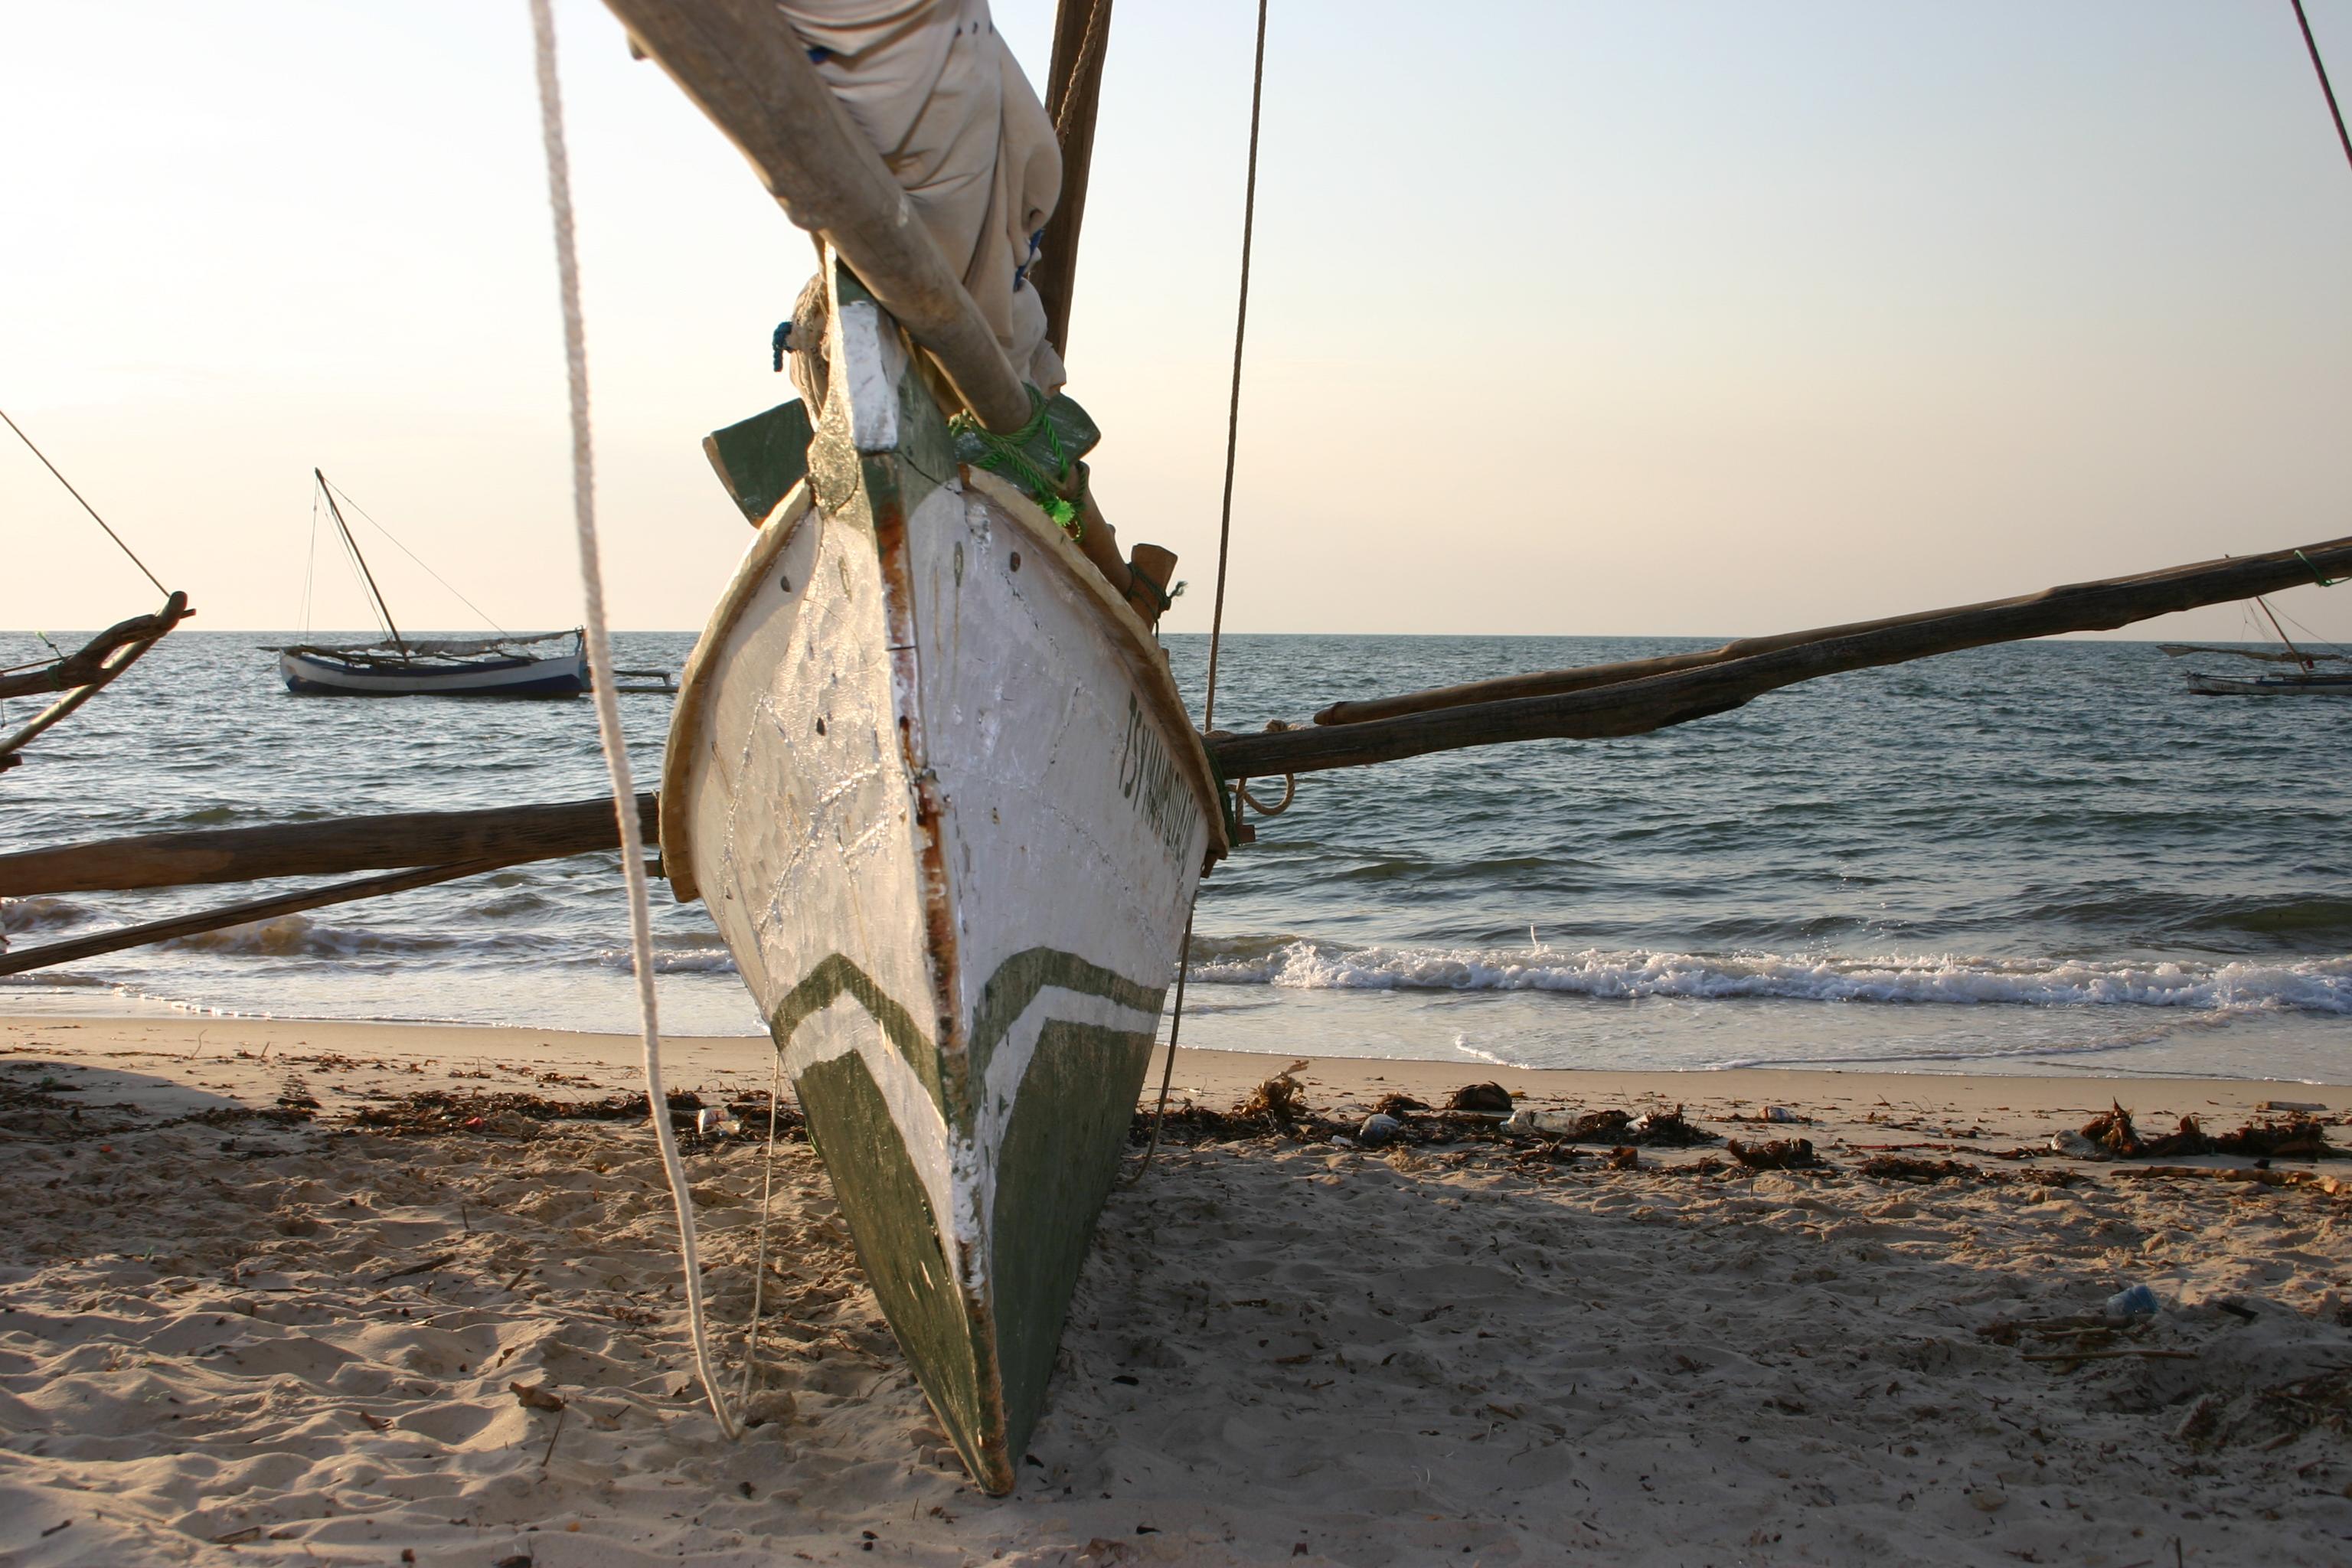 über uns, offene Stellen Mahajanga, Strand